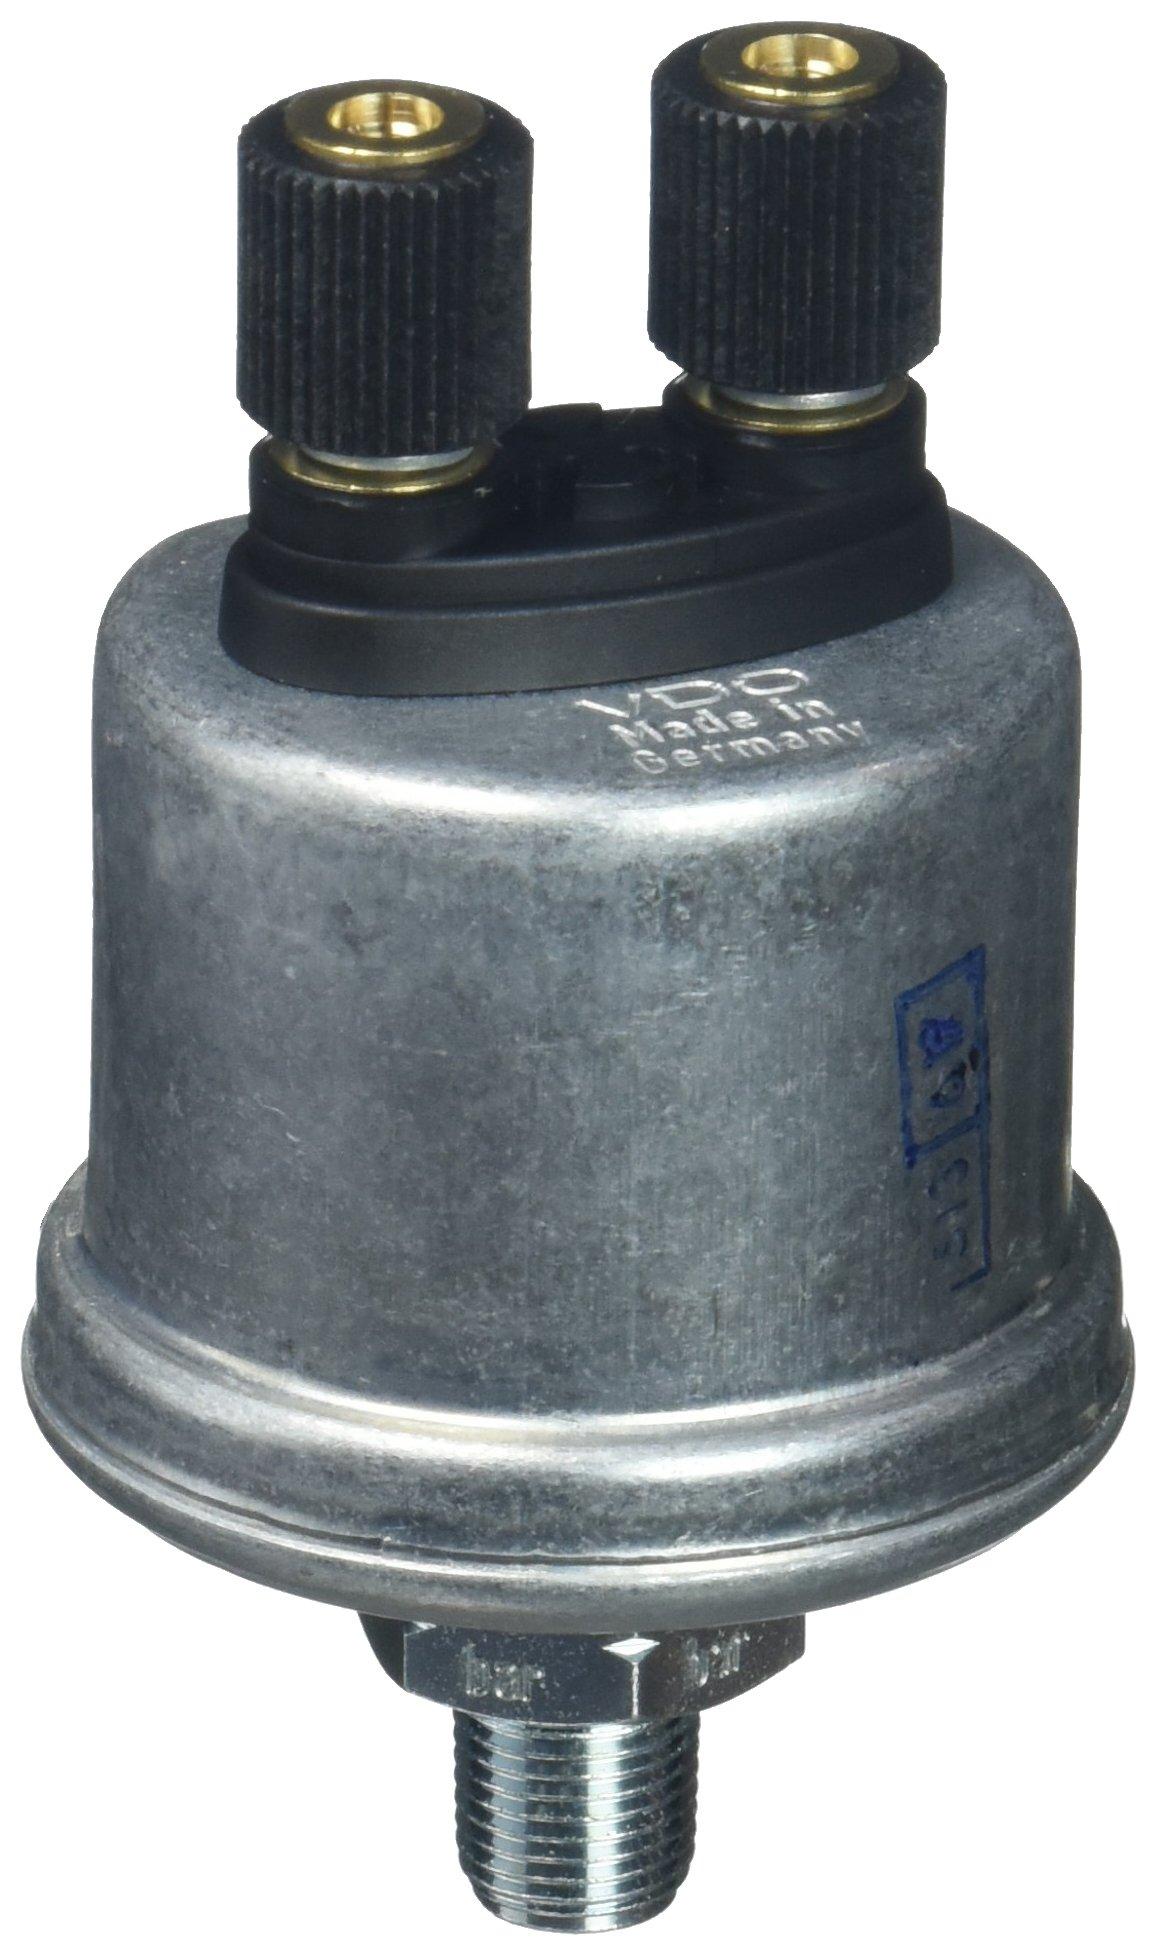 VDO 360 025 Gauge Pressure Sender by VDO